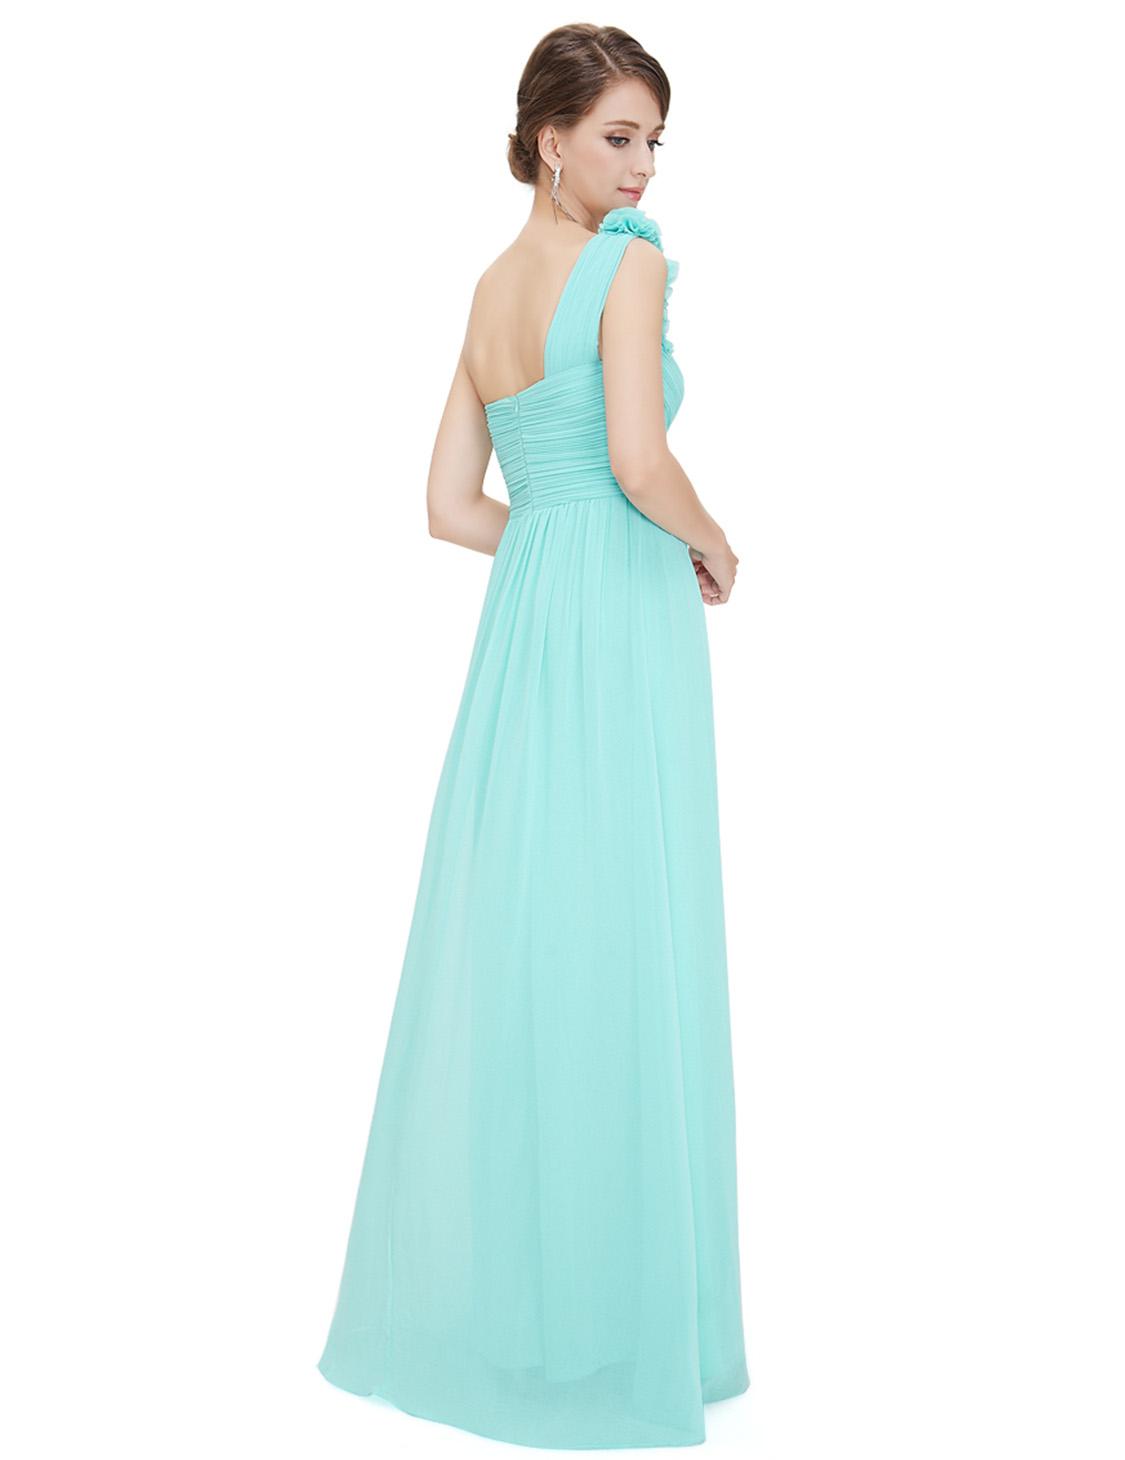 Ever-Pretty-US-Long-Bridesmaid-Dresses-One-Shoulder-Evening-Party-Dresses-08237 thumbnail 14